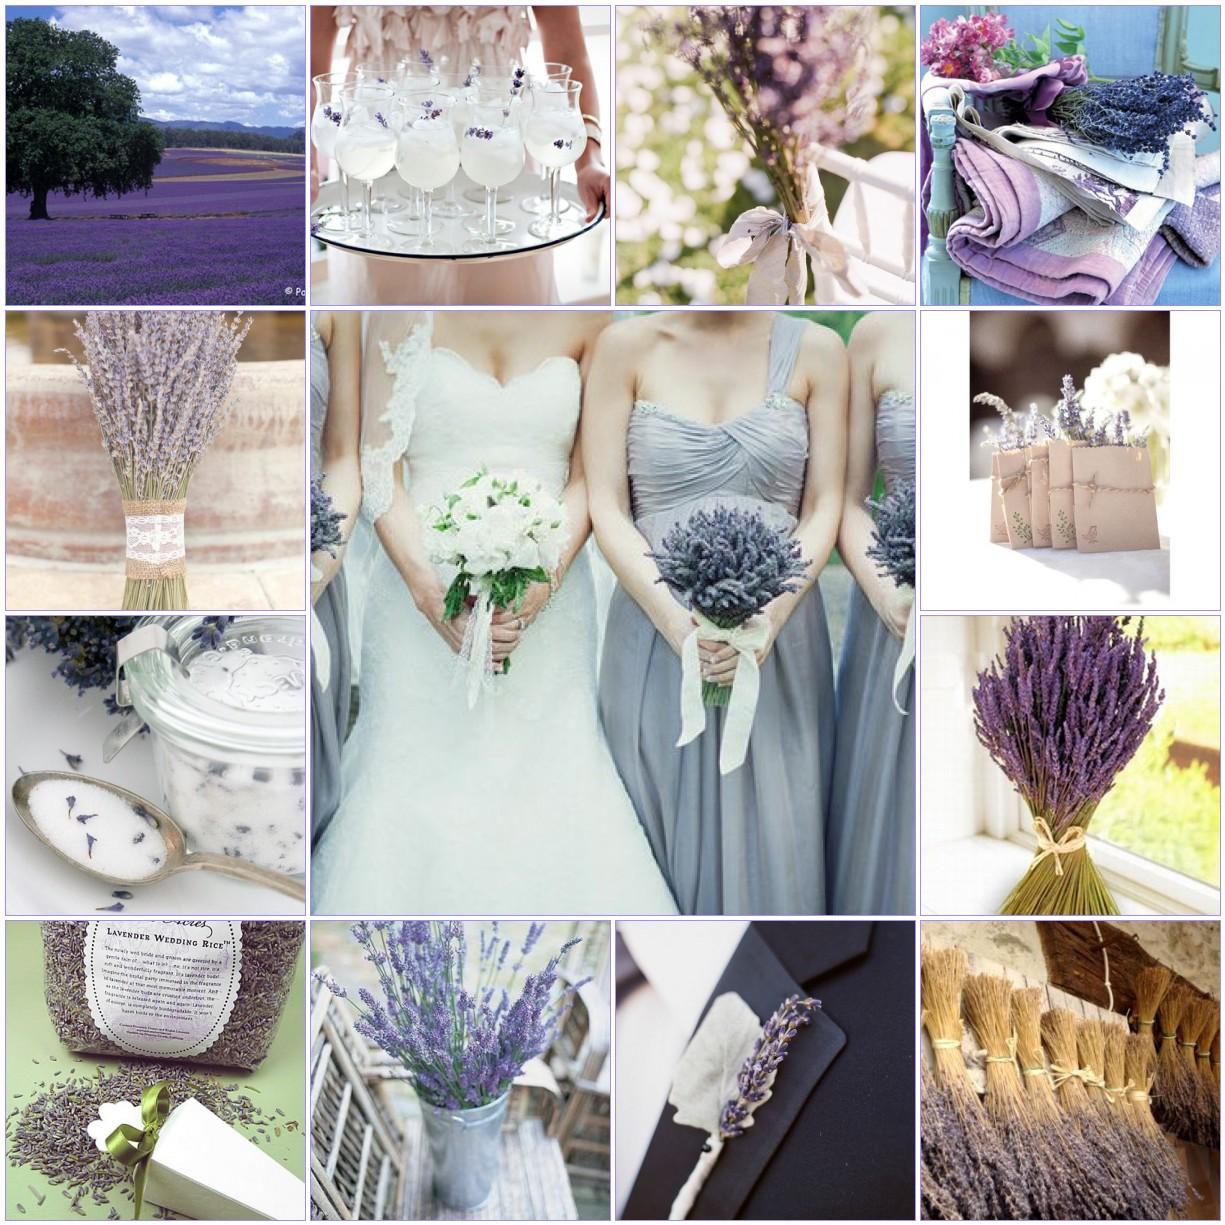 nụ hoa lavender khô